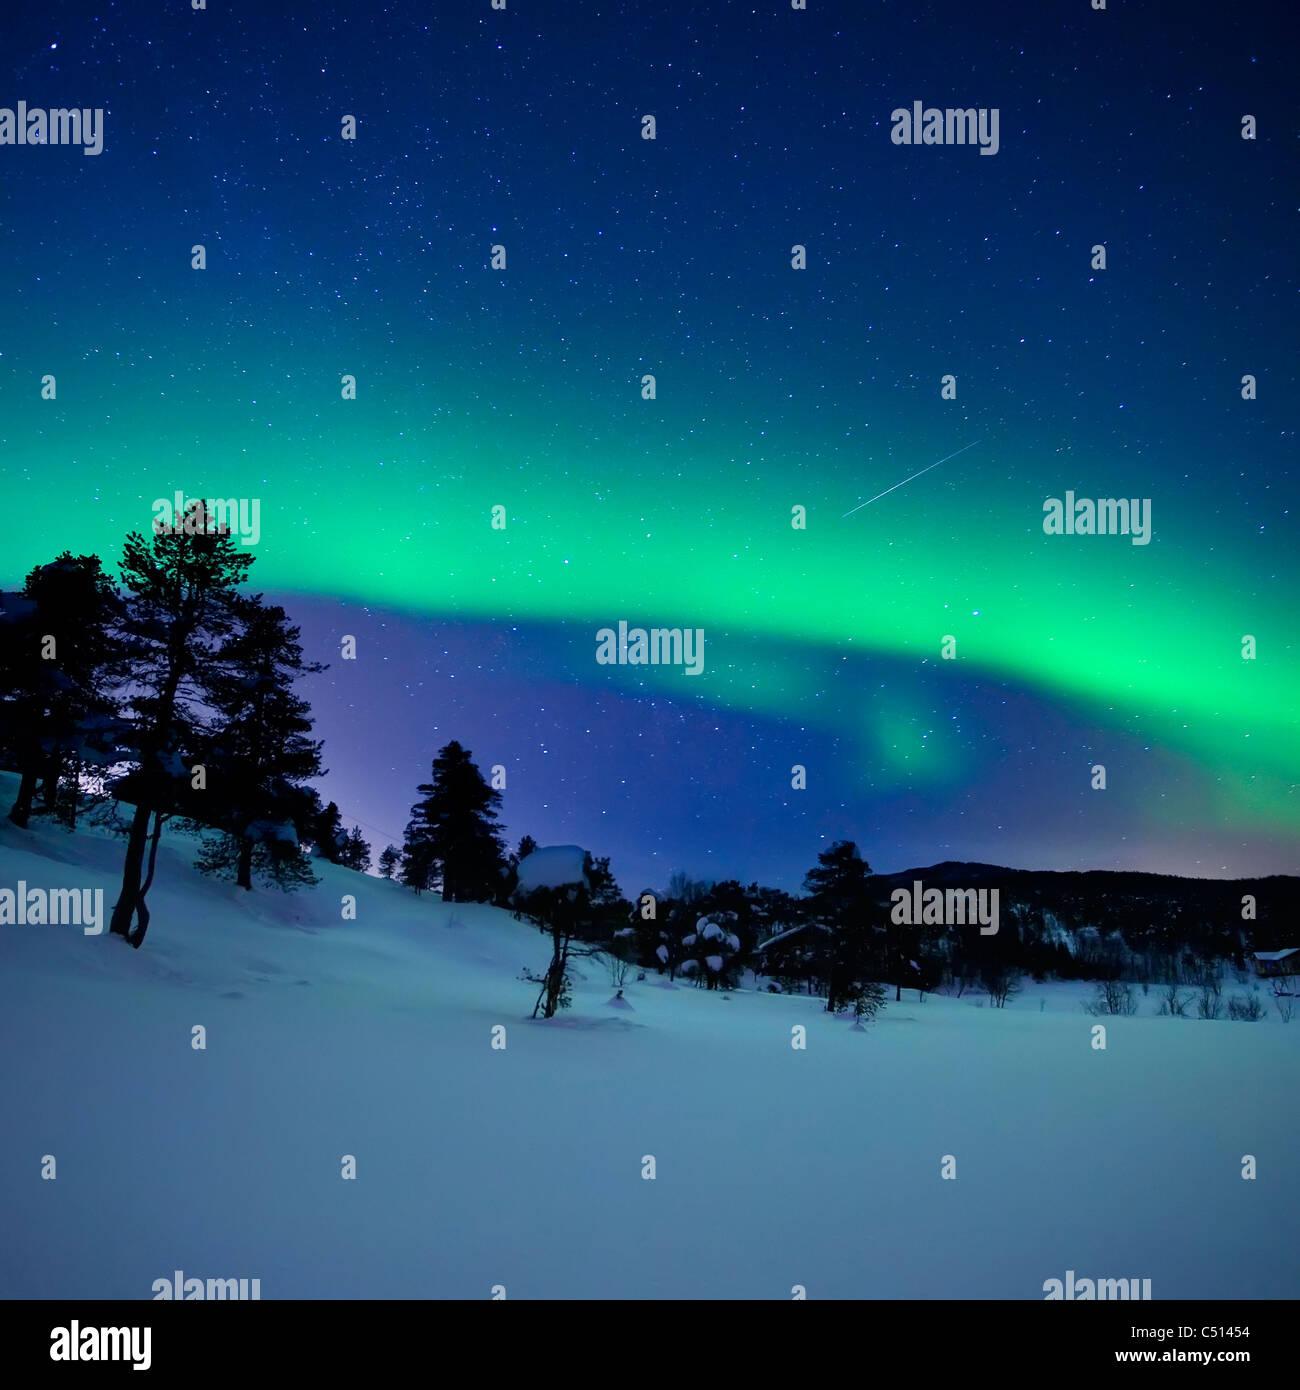 Arctic Woods Stock Photos & Arctic Woods Stock Images